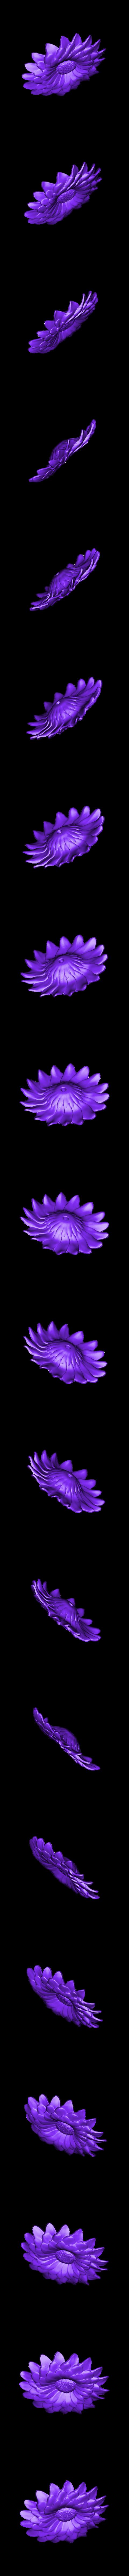 flower.stl Download free STL file It's a flower! • 3D printing template, 3DJourney